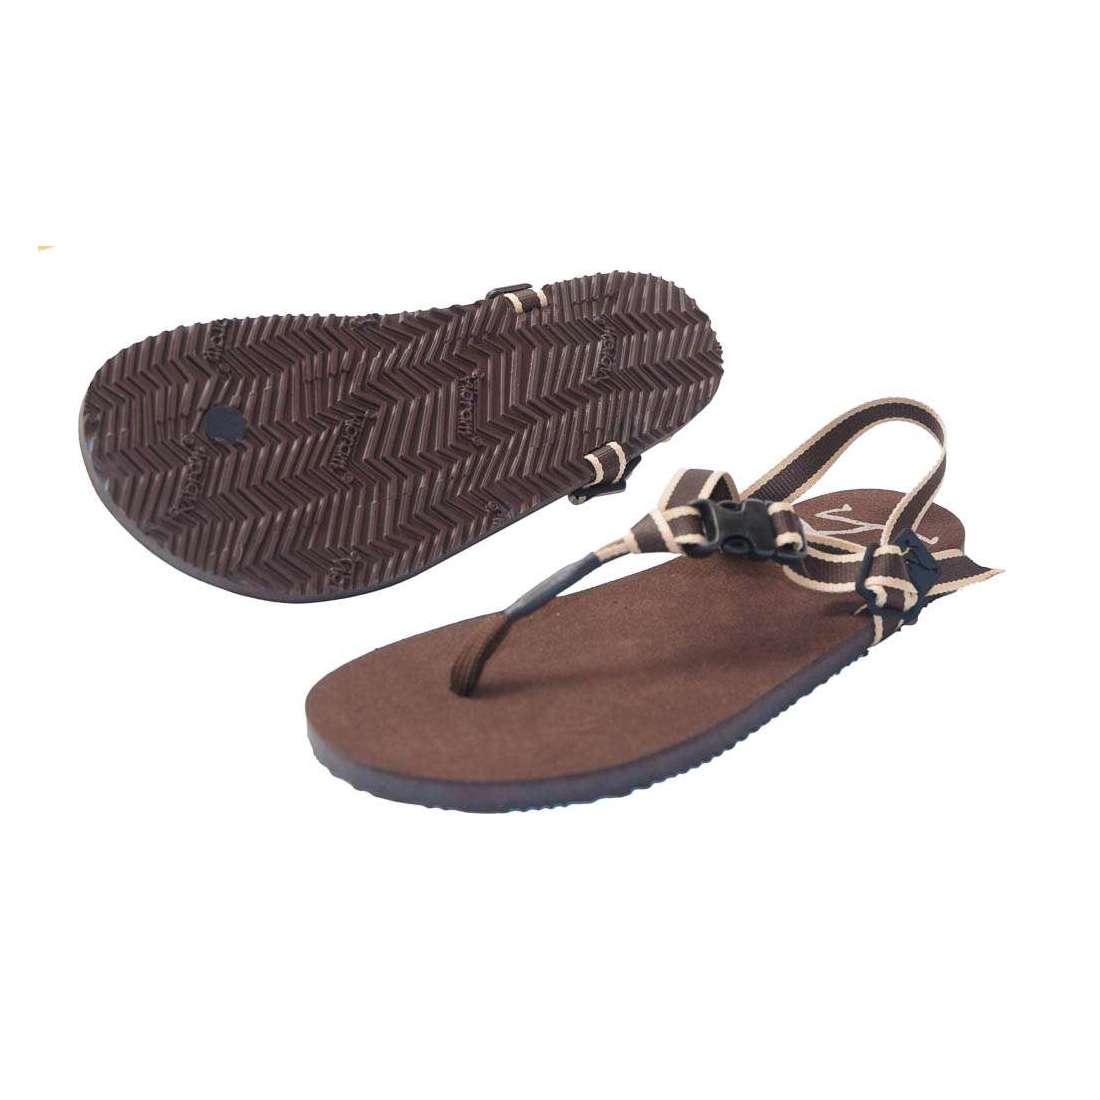 Minimal Sandalia 40 Sandals Correr Barefoot Deporte Vibram Huarache lKJc1F